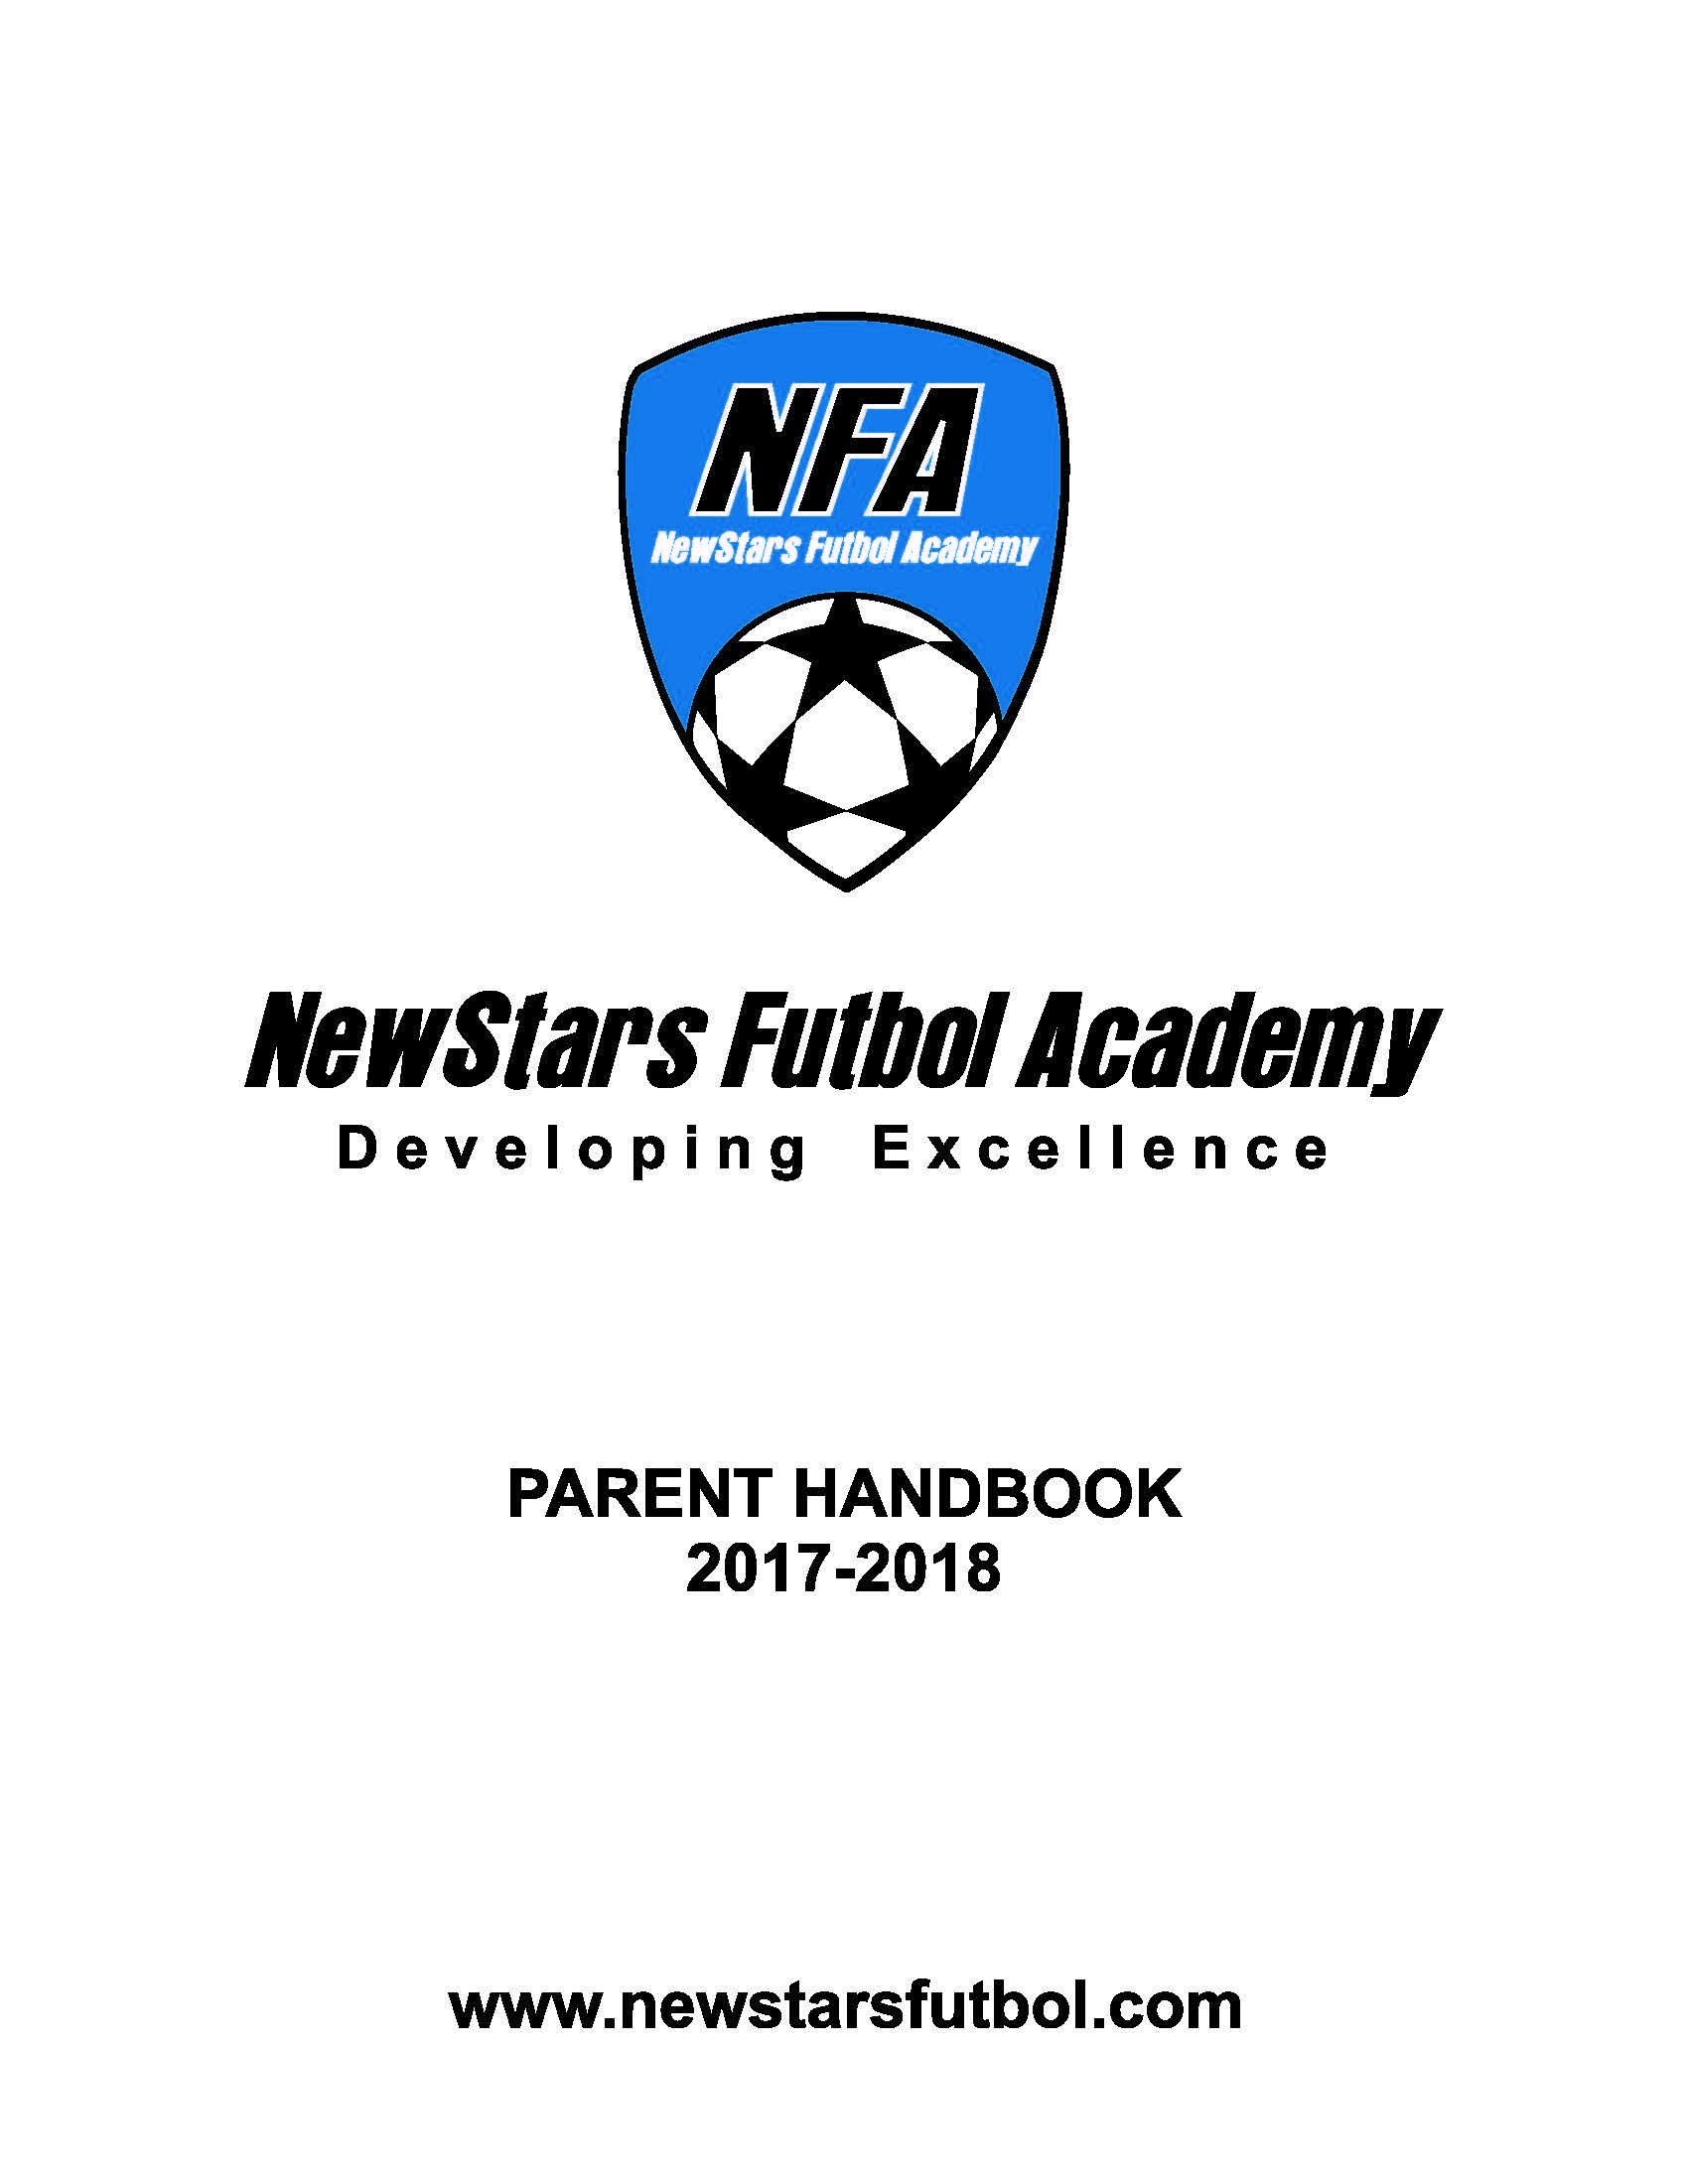 NFA Members Handbook Cover